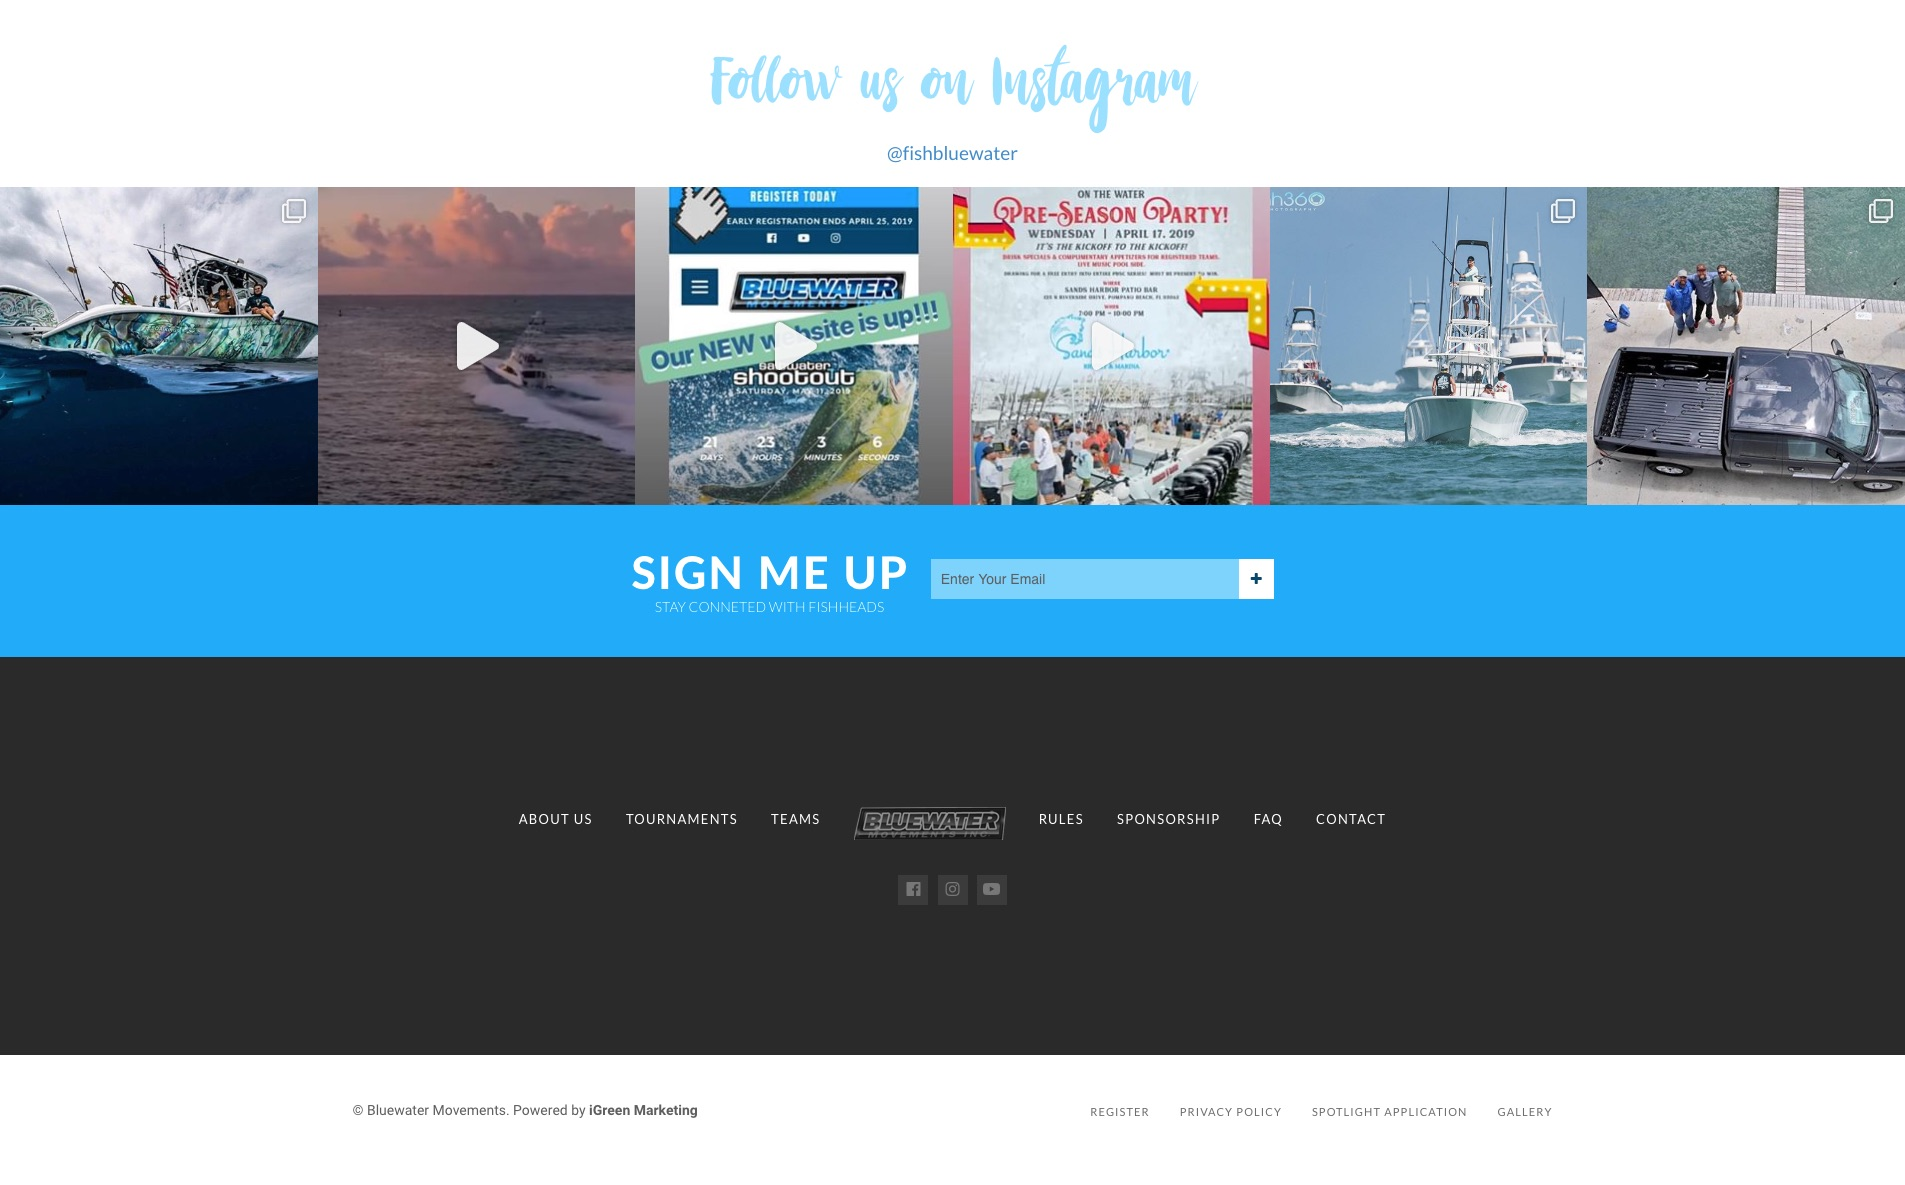 bluewatermovements - iGreen Marketing